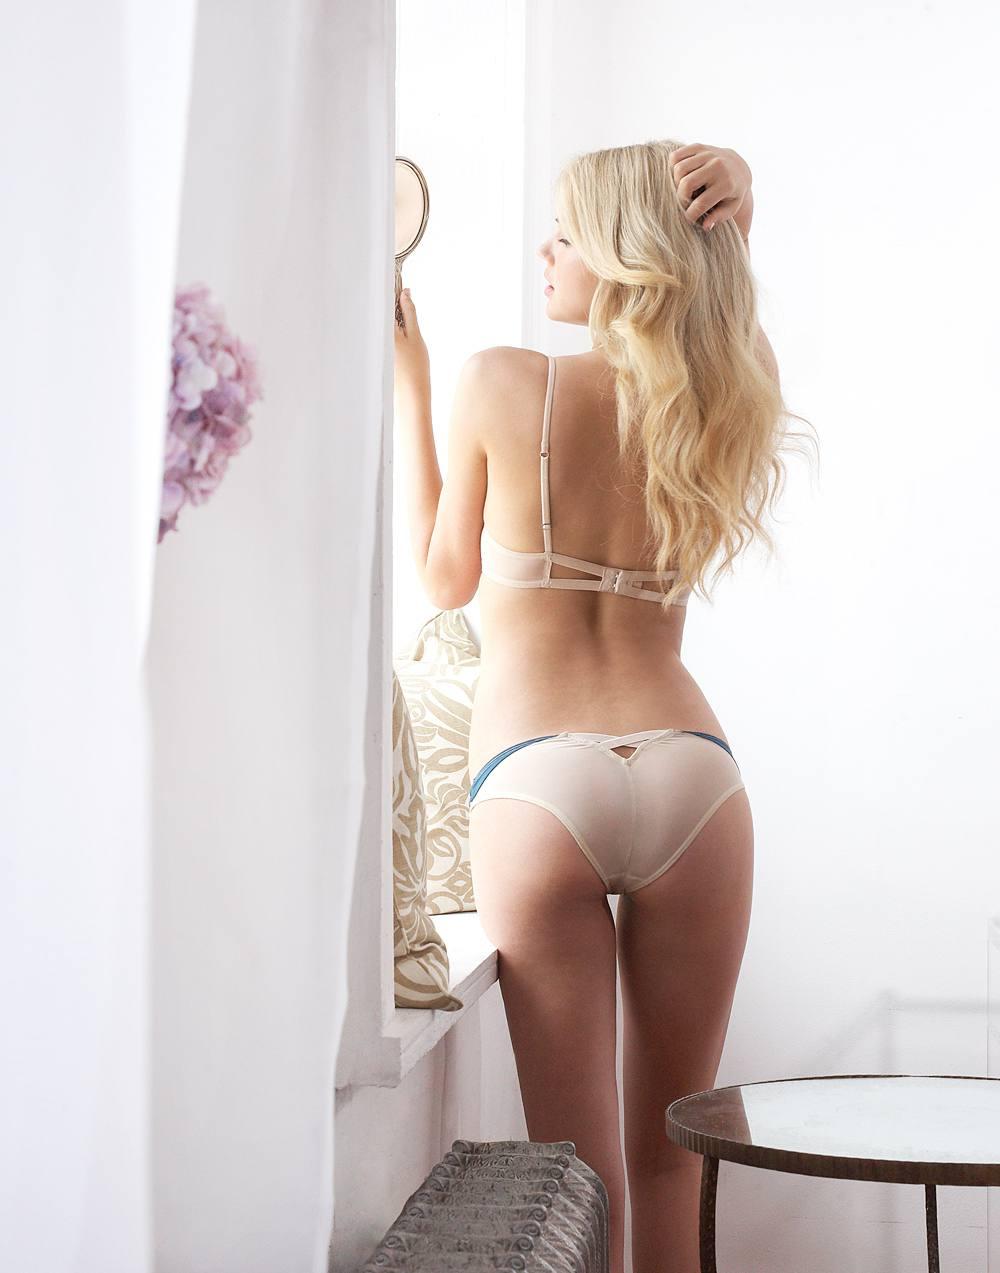 Kate Upton Hot In Lingerie